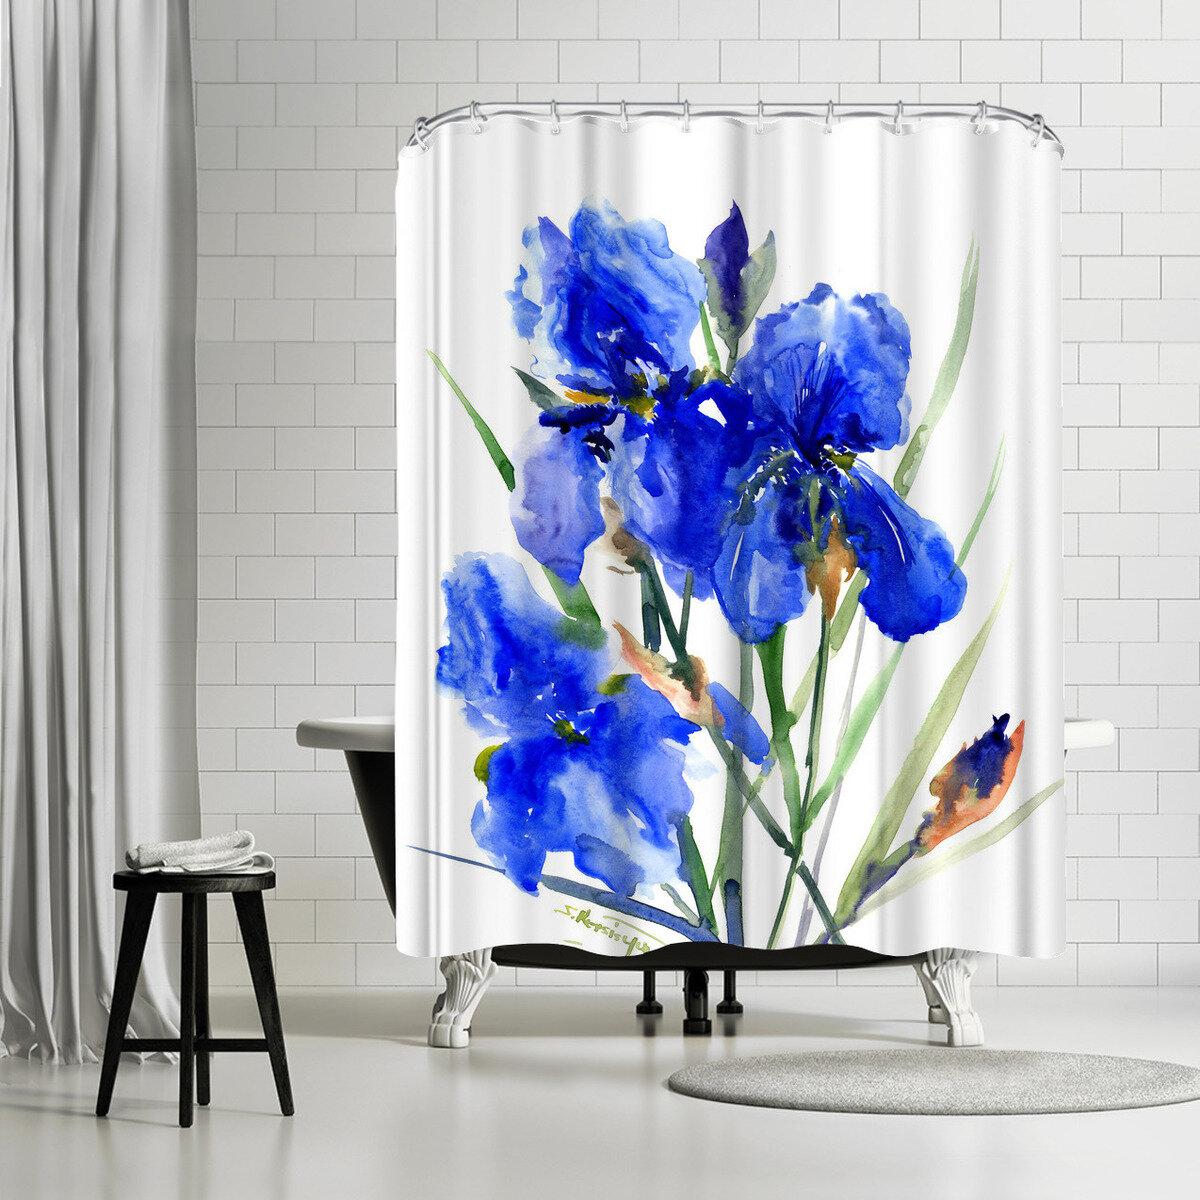 East Urban Home Suren Nersisyan Iris Flowers 2 Single Shower Curtain Wayfair